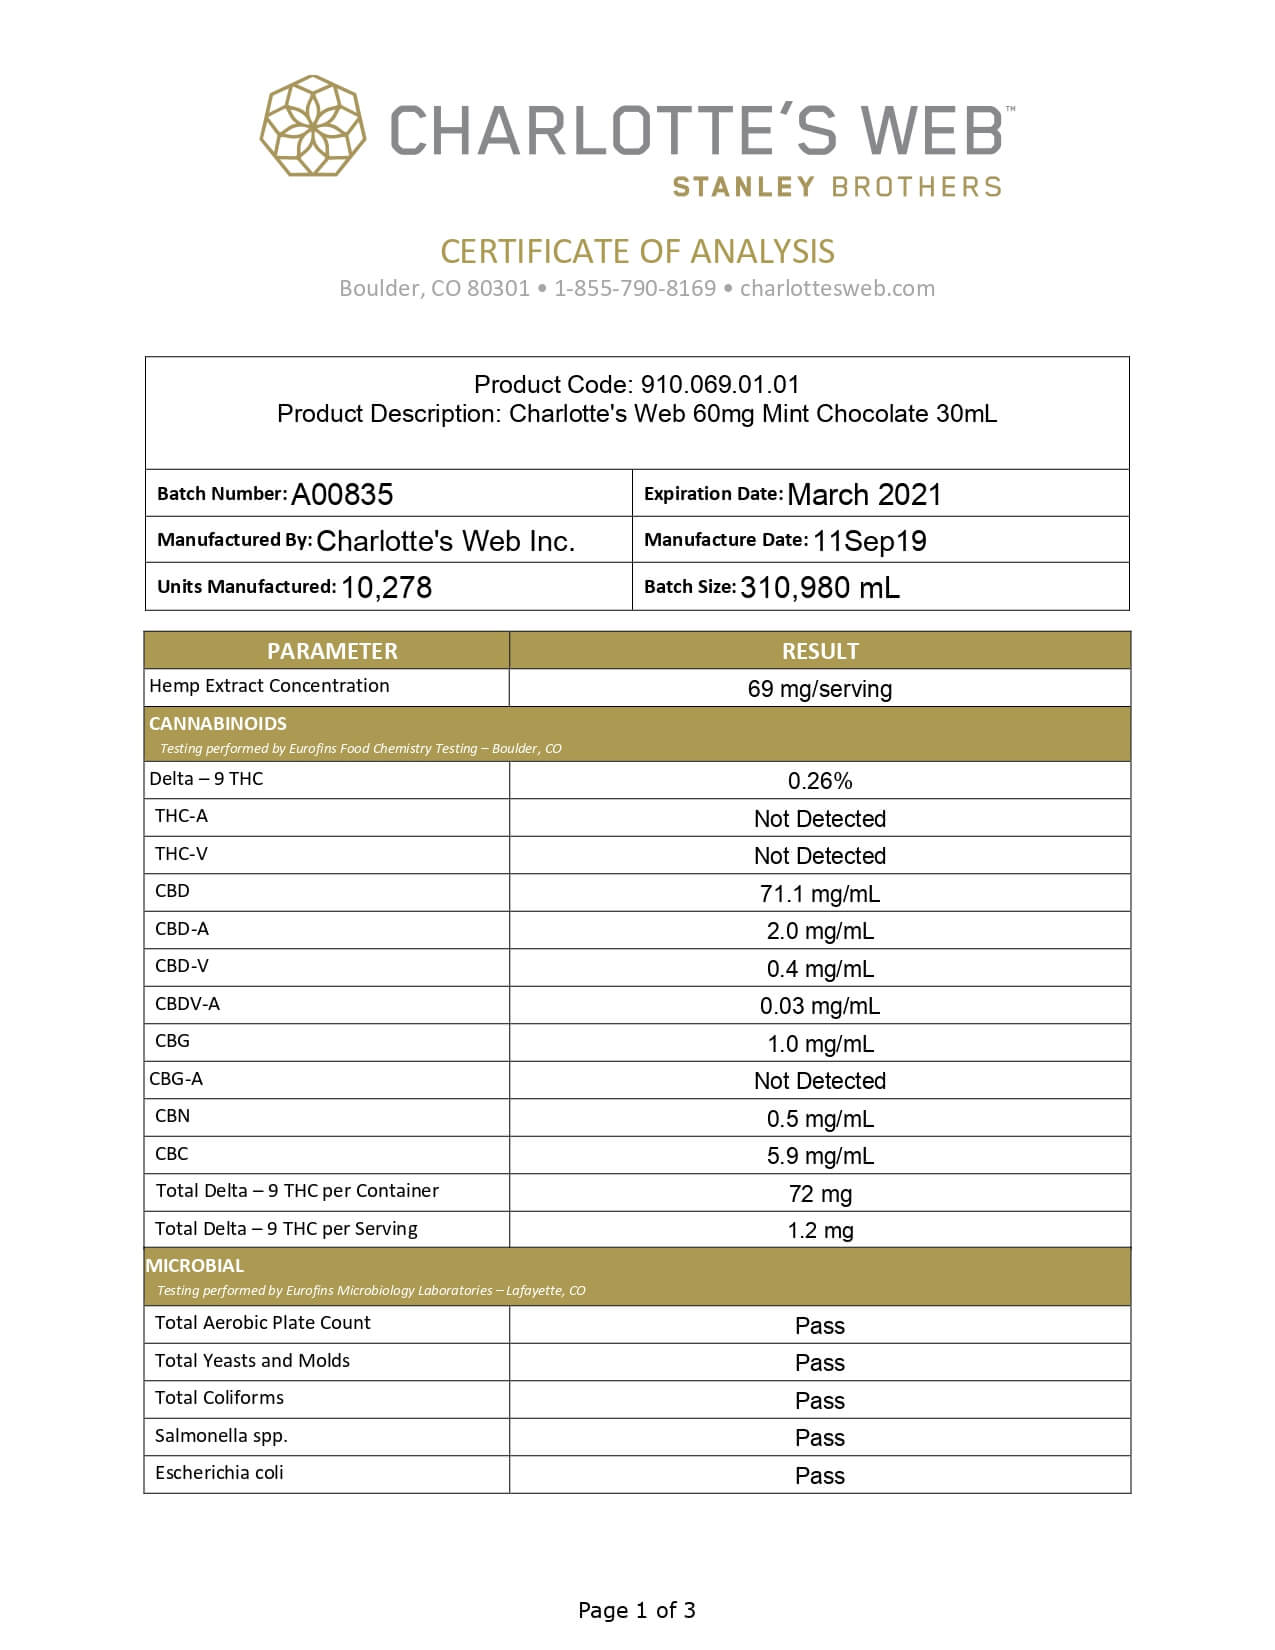 Charlottes Web Full Spectrum Mint Chocolate 60mg 1ml Lab Report